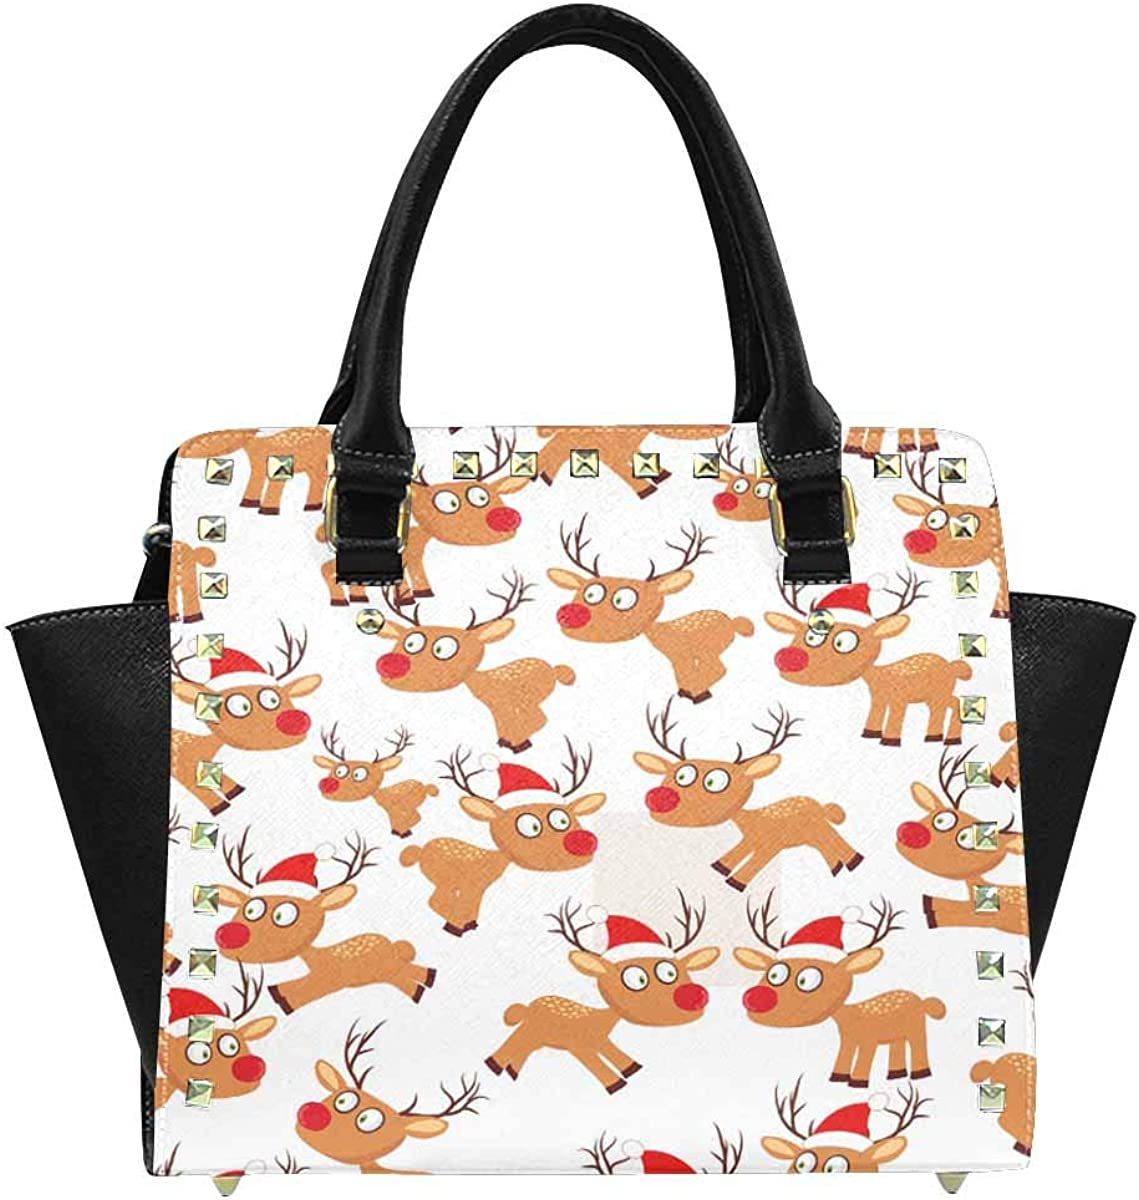 INTERESTPRINT Cute Christmas Deer Rivet Shoulder Handbag Tote Bags Wallets